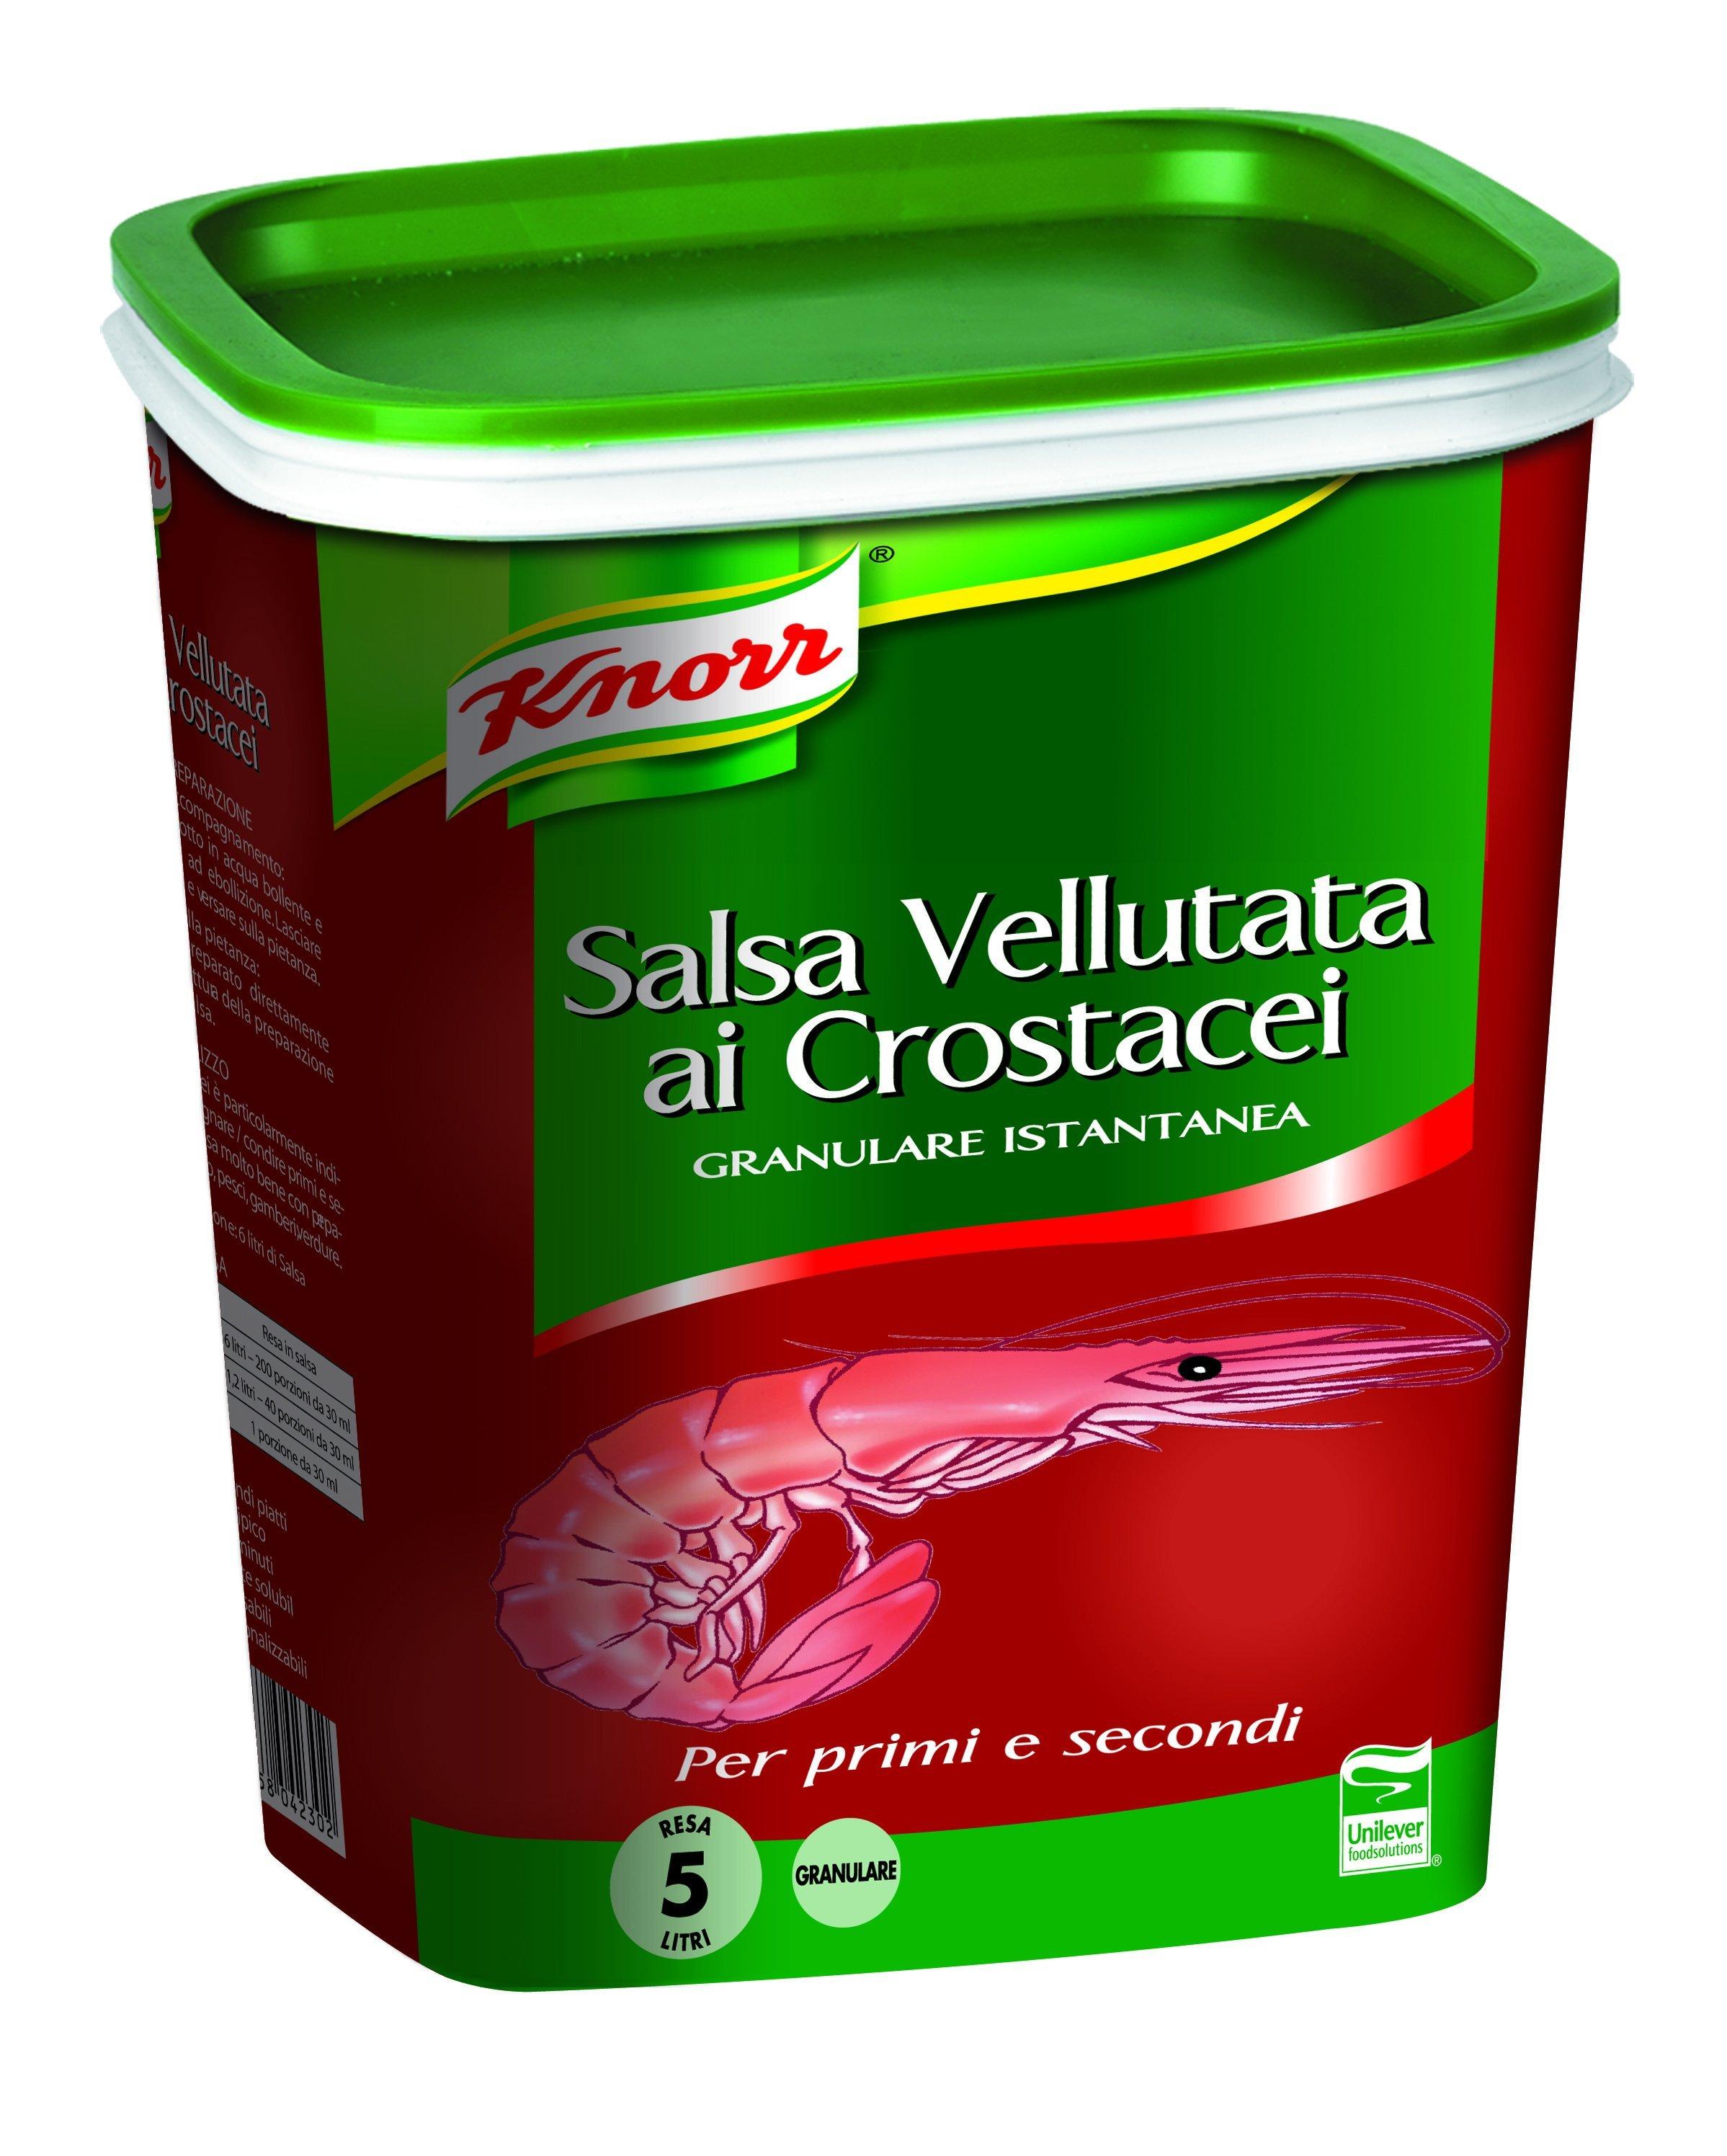 Knorr Salsa Vellutata ai Crostacei Granulare Istantanea 1 Kg -